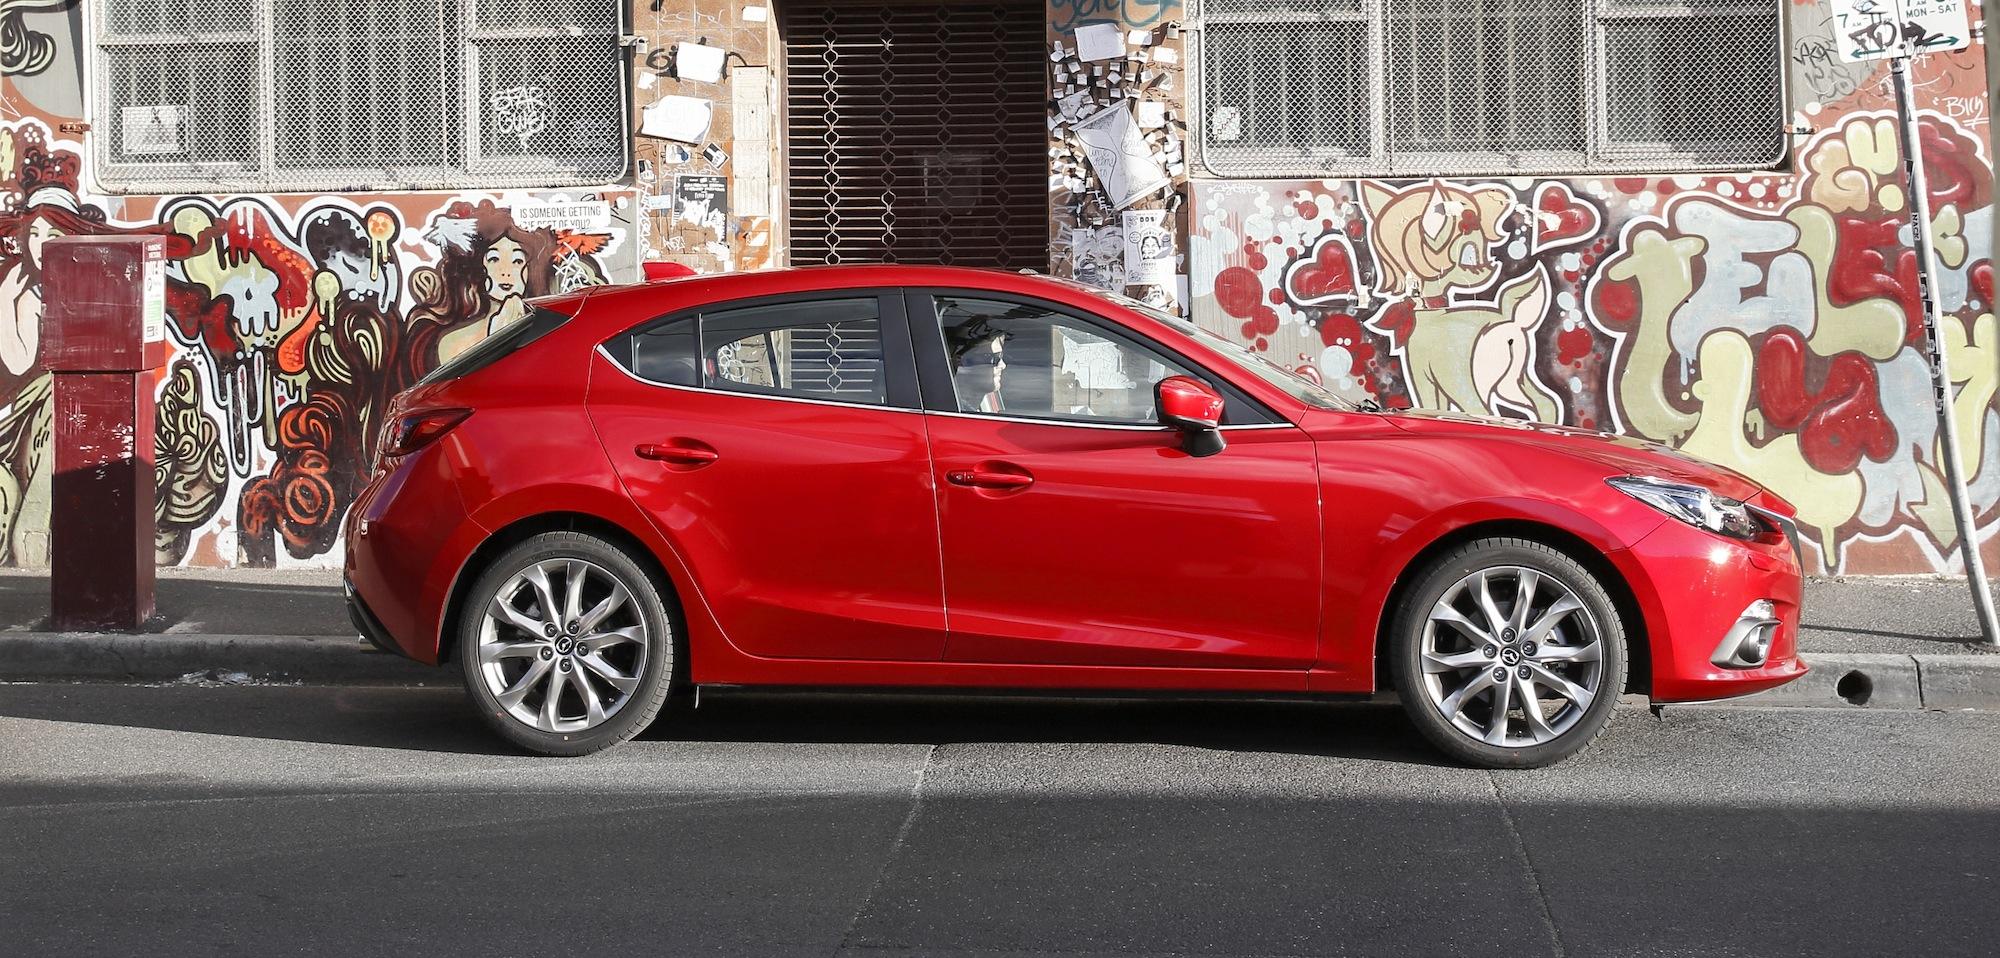 Mazda 3 Review Xd Astina Diesel Photos Caradvice